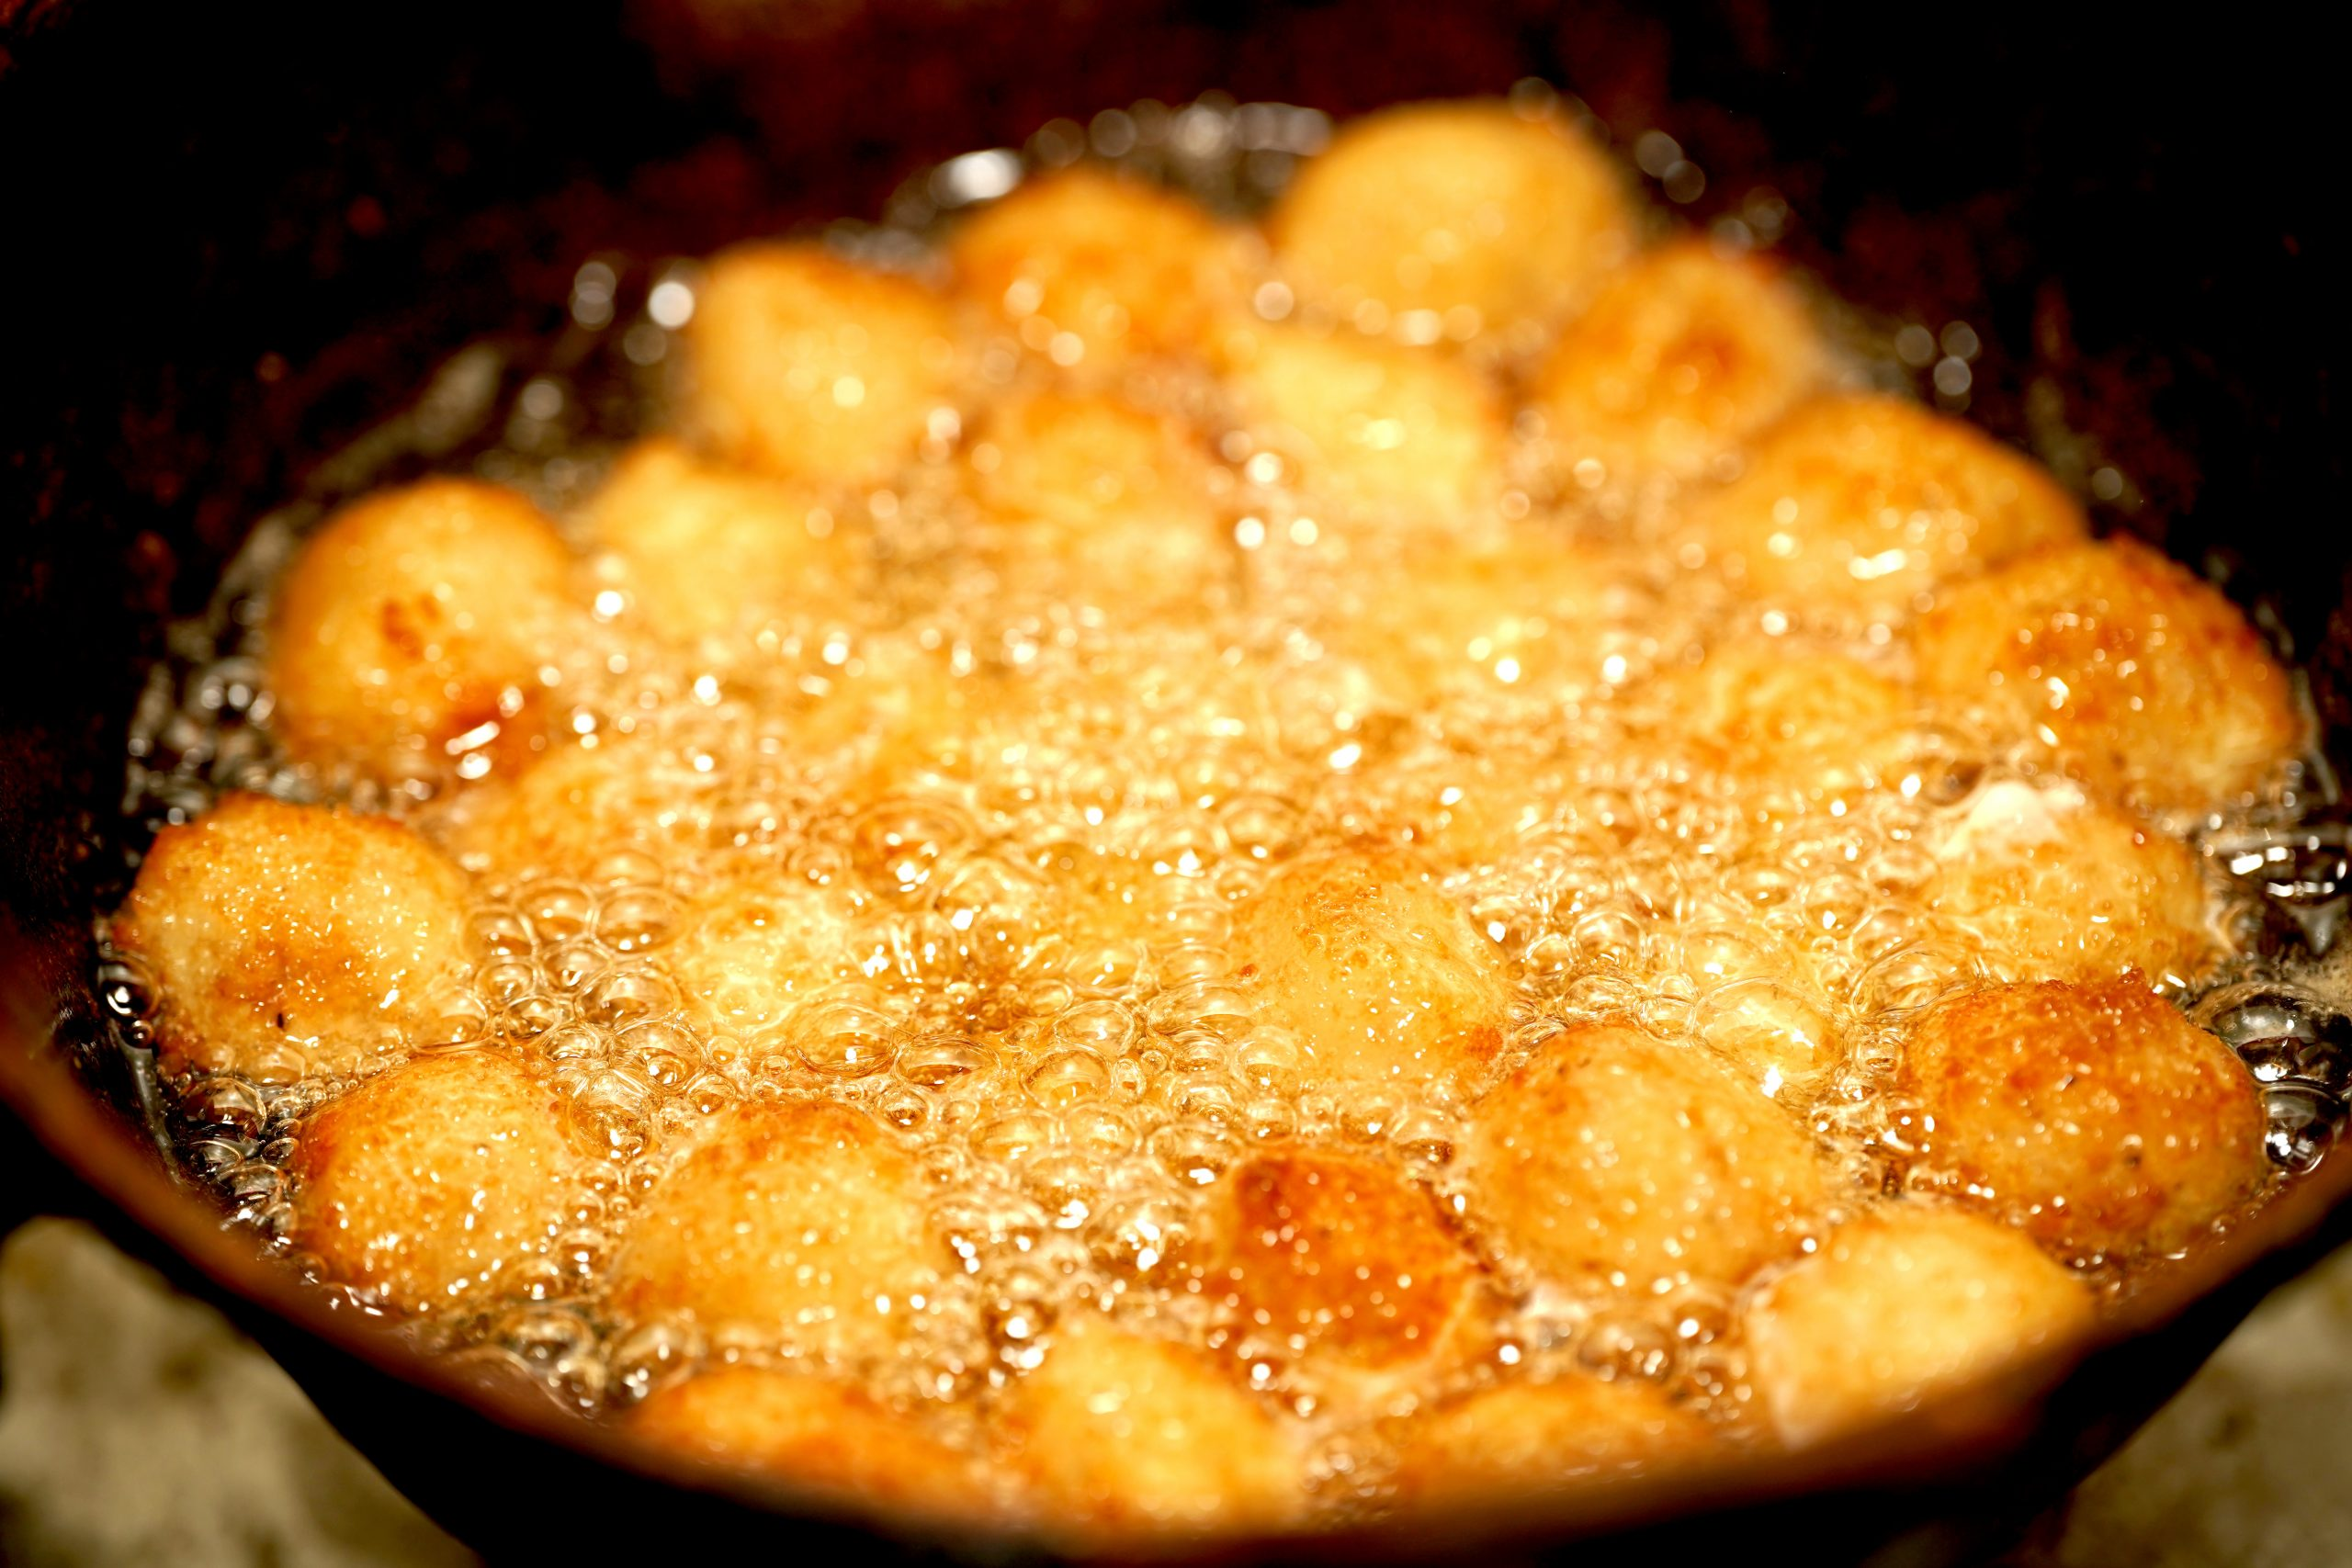 Food items in frying pan